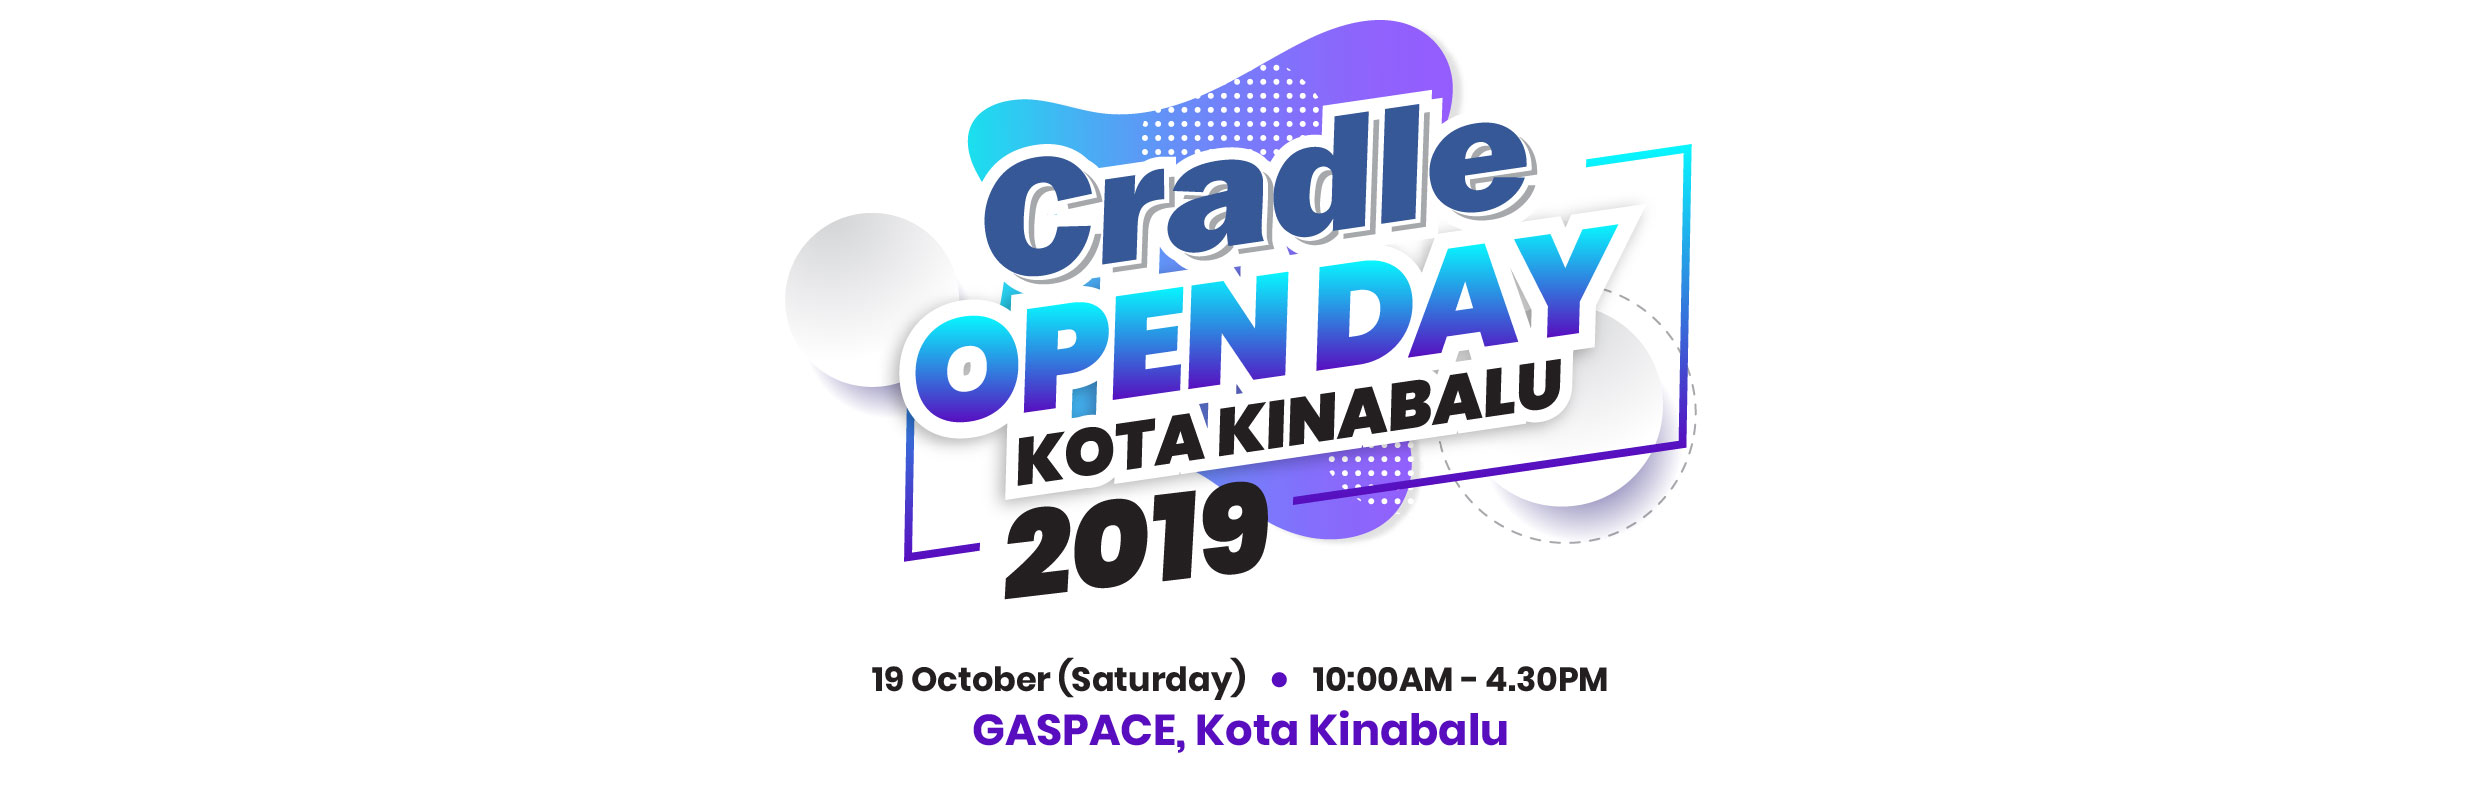 Cradle Open Day